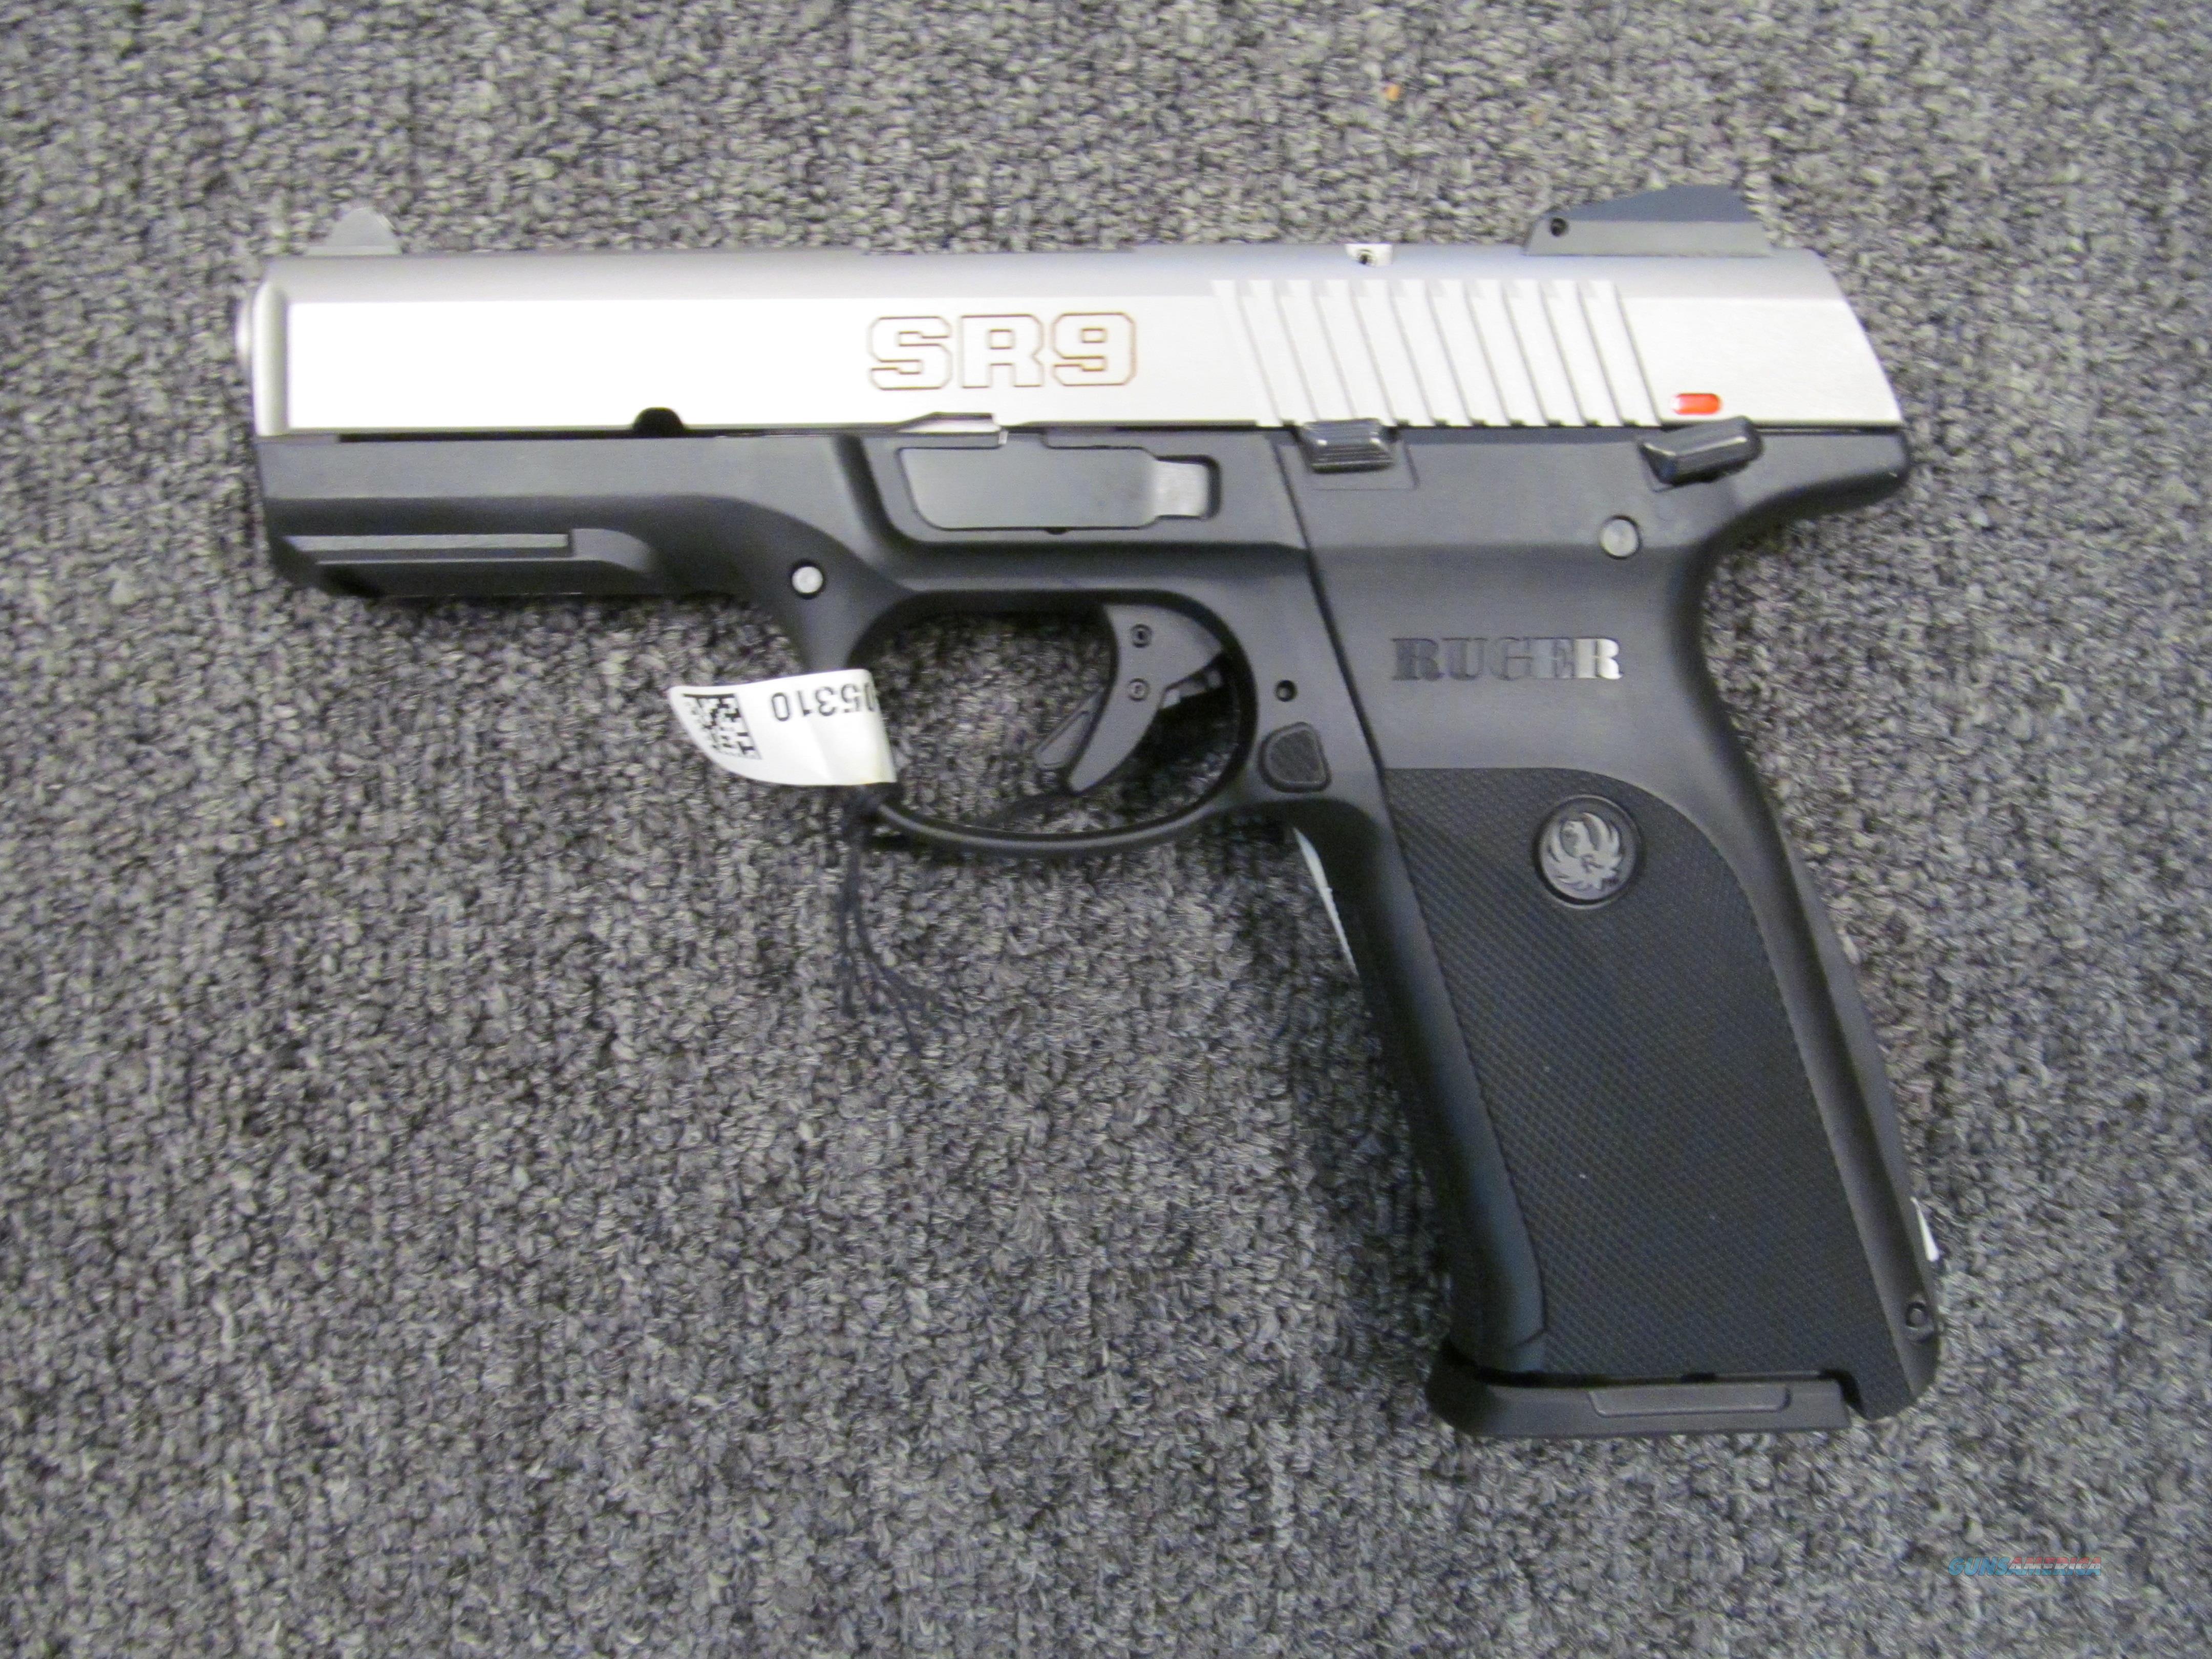 Ruger SR9 Bi Tone  Guns > Pistols > Ruger Semi-Auto Pistols > SR Family > SR9